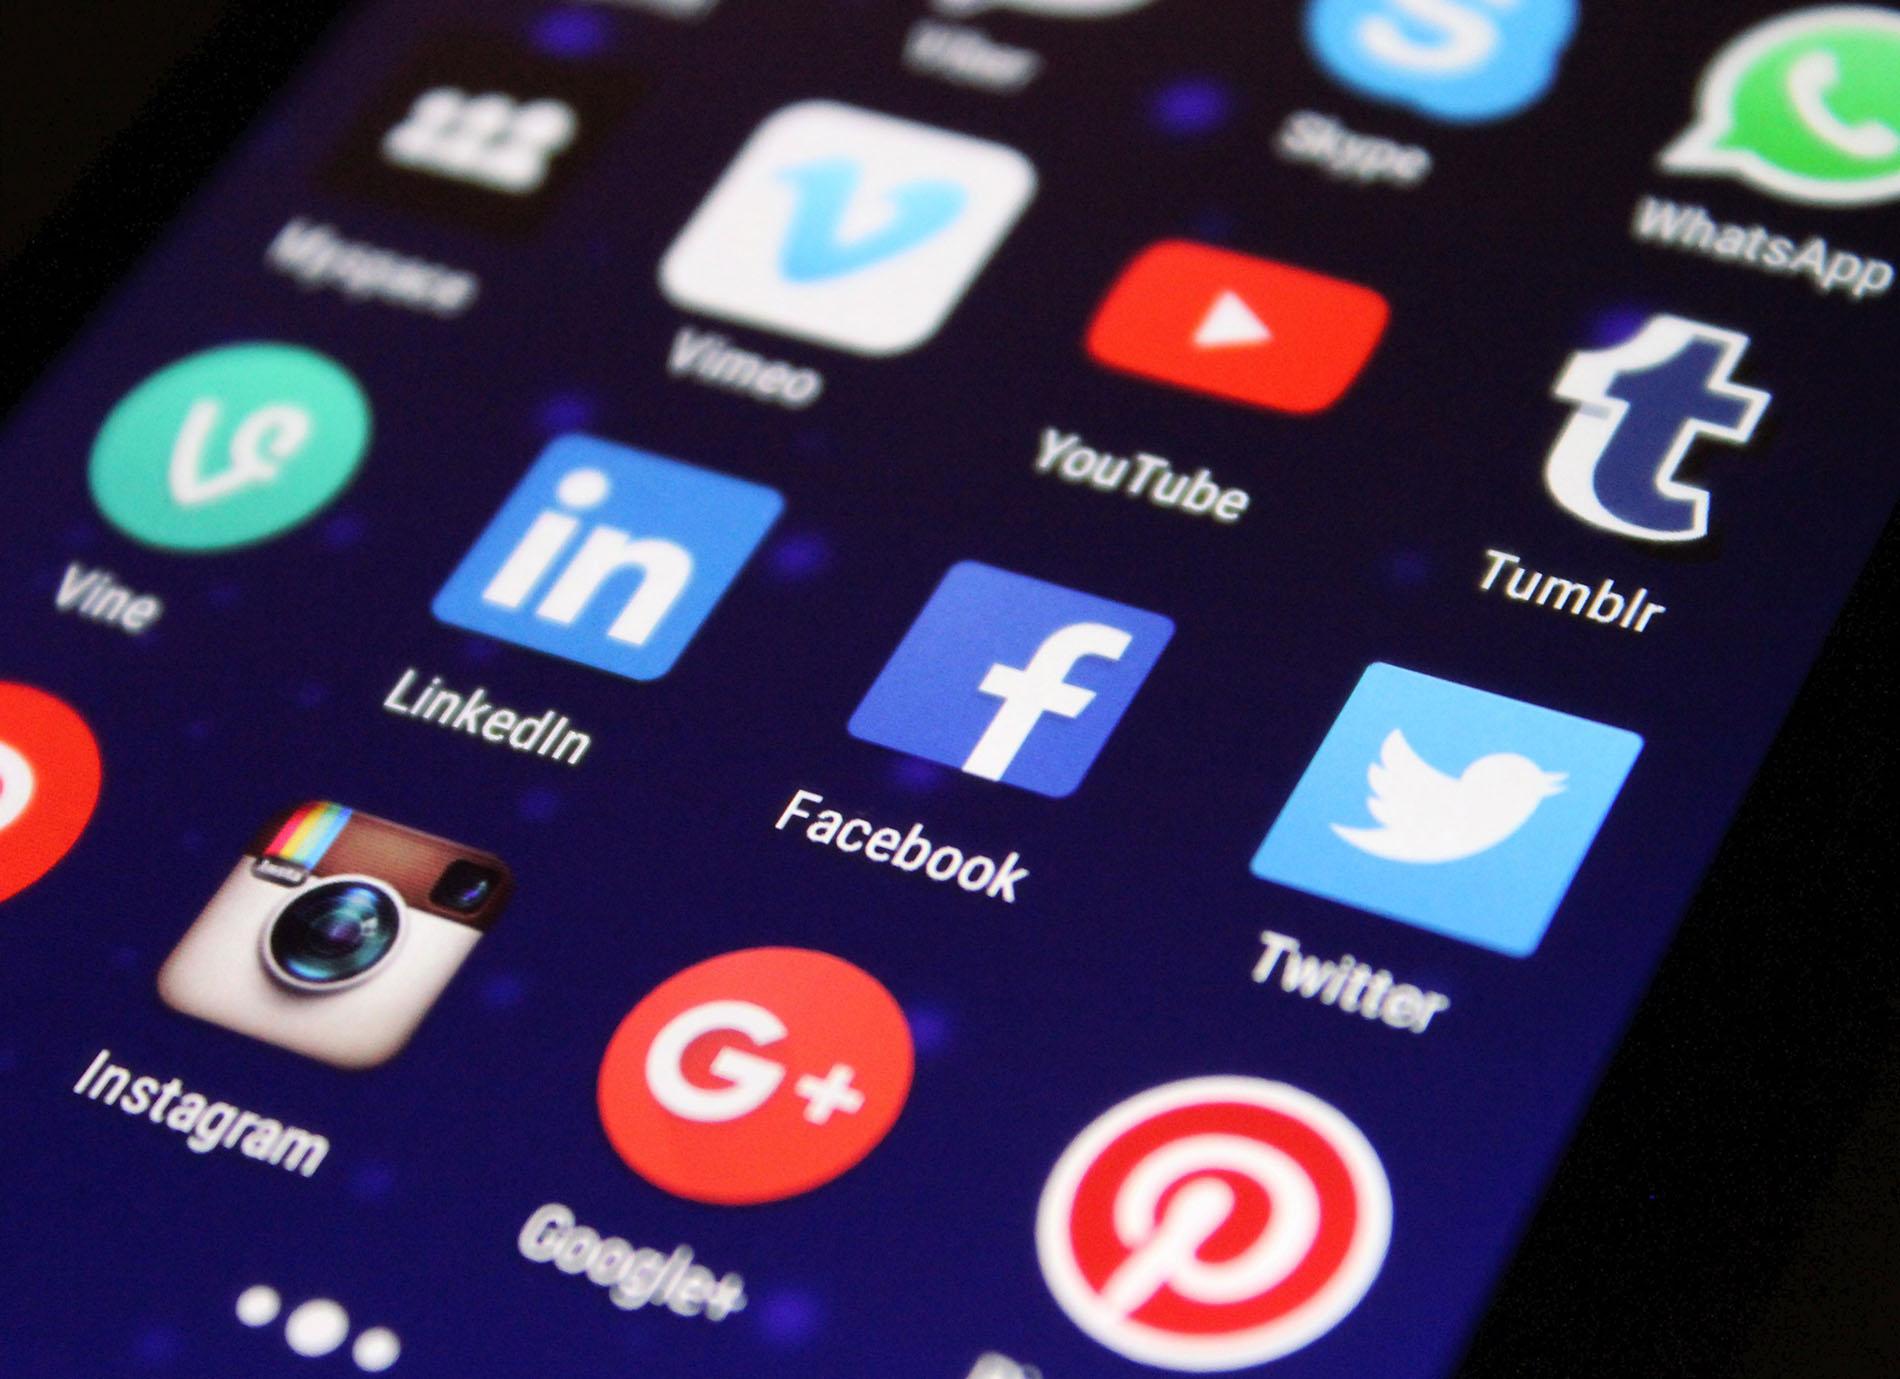 Social media icons on a cellphone